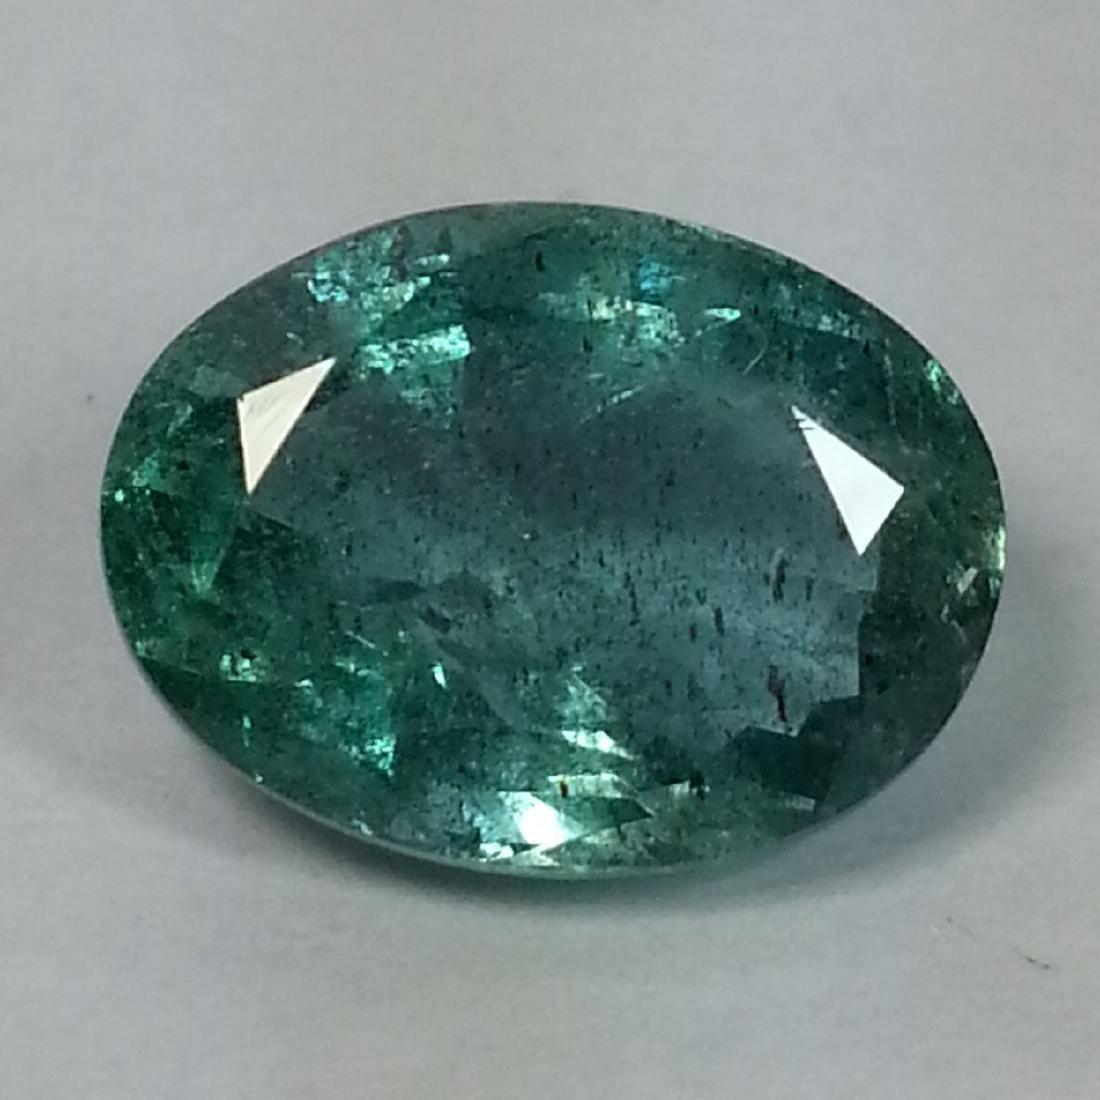 Emerald - 3.08 ct